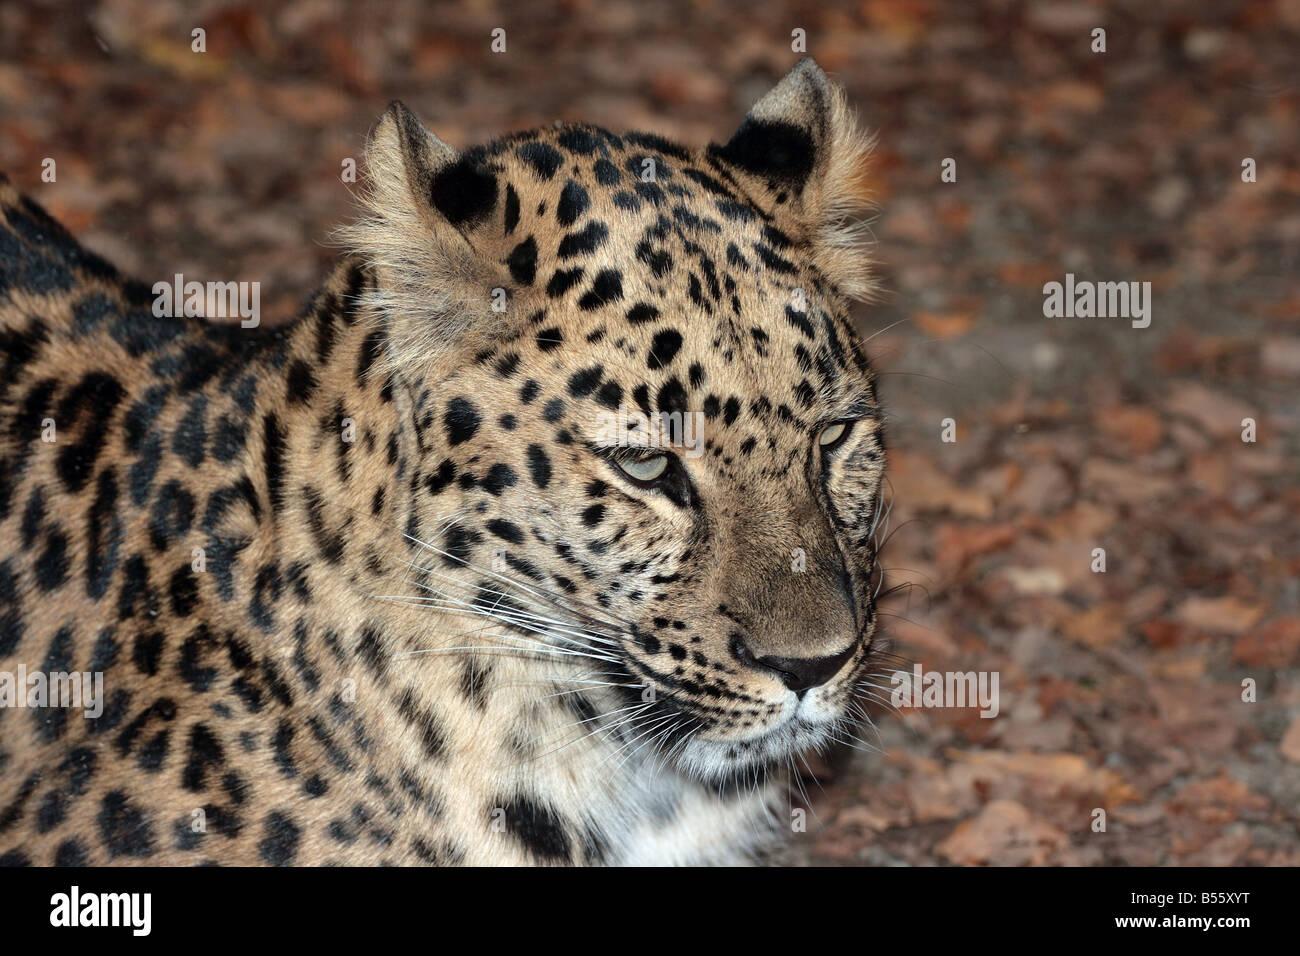 Amur Leopard at the Erie Zoo, Erie, Pennsylvania, USA. - Stock Image